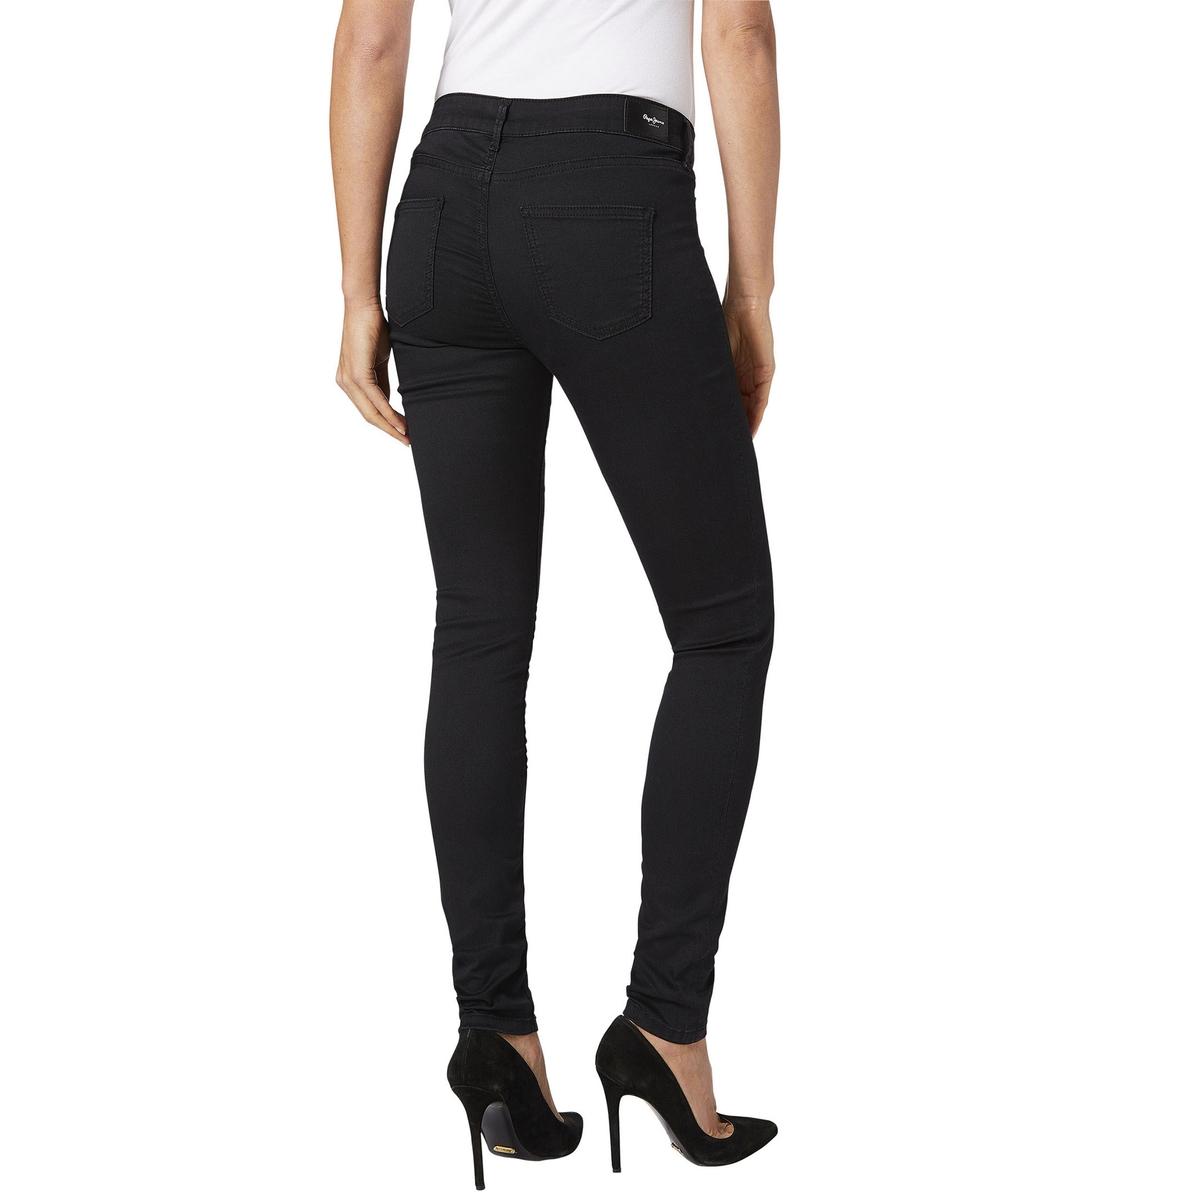 Imagen secundaria de producto de Vaqueros skinny tejido muy ligero PIXIE FLY JEAN - Pepe Jeans